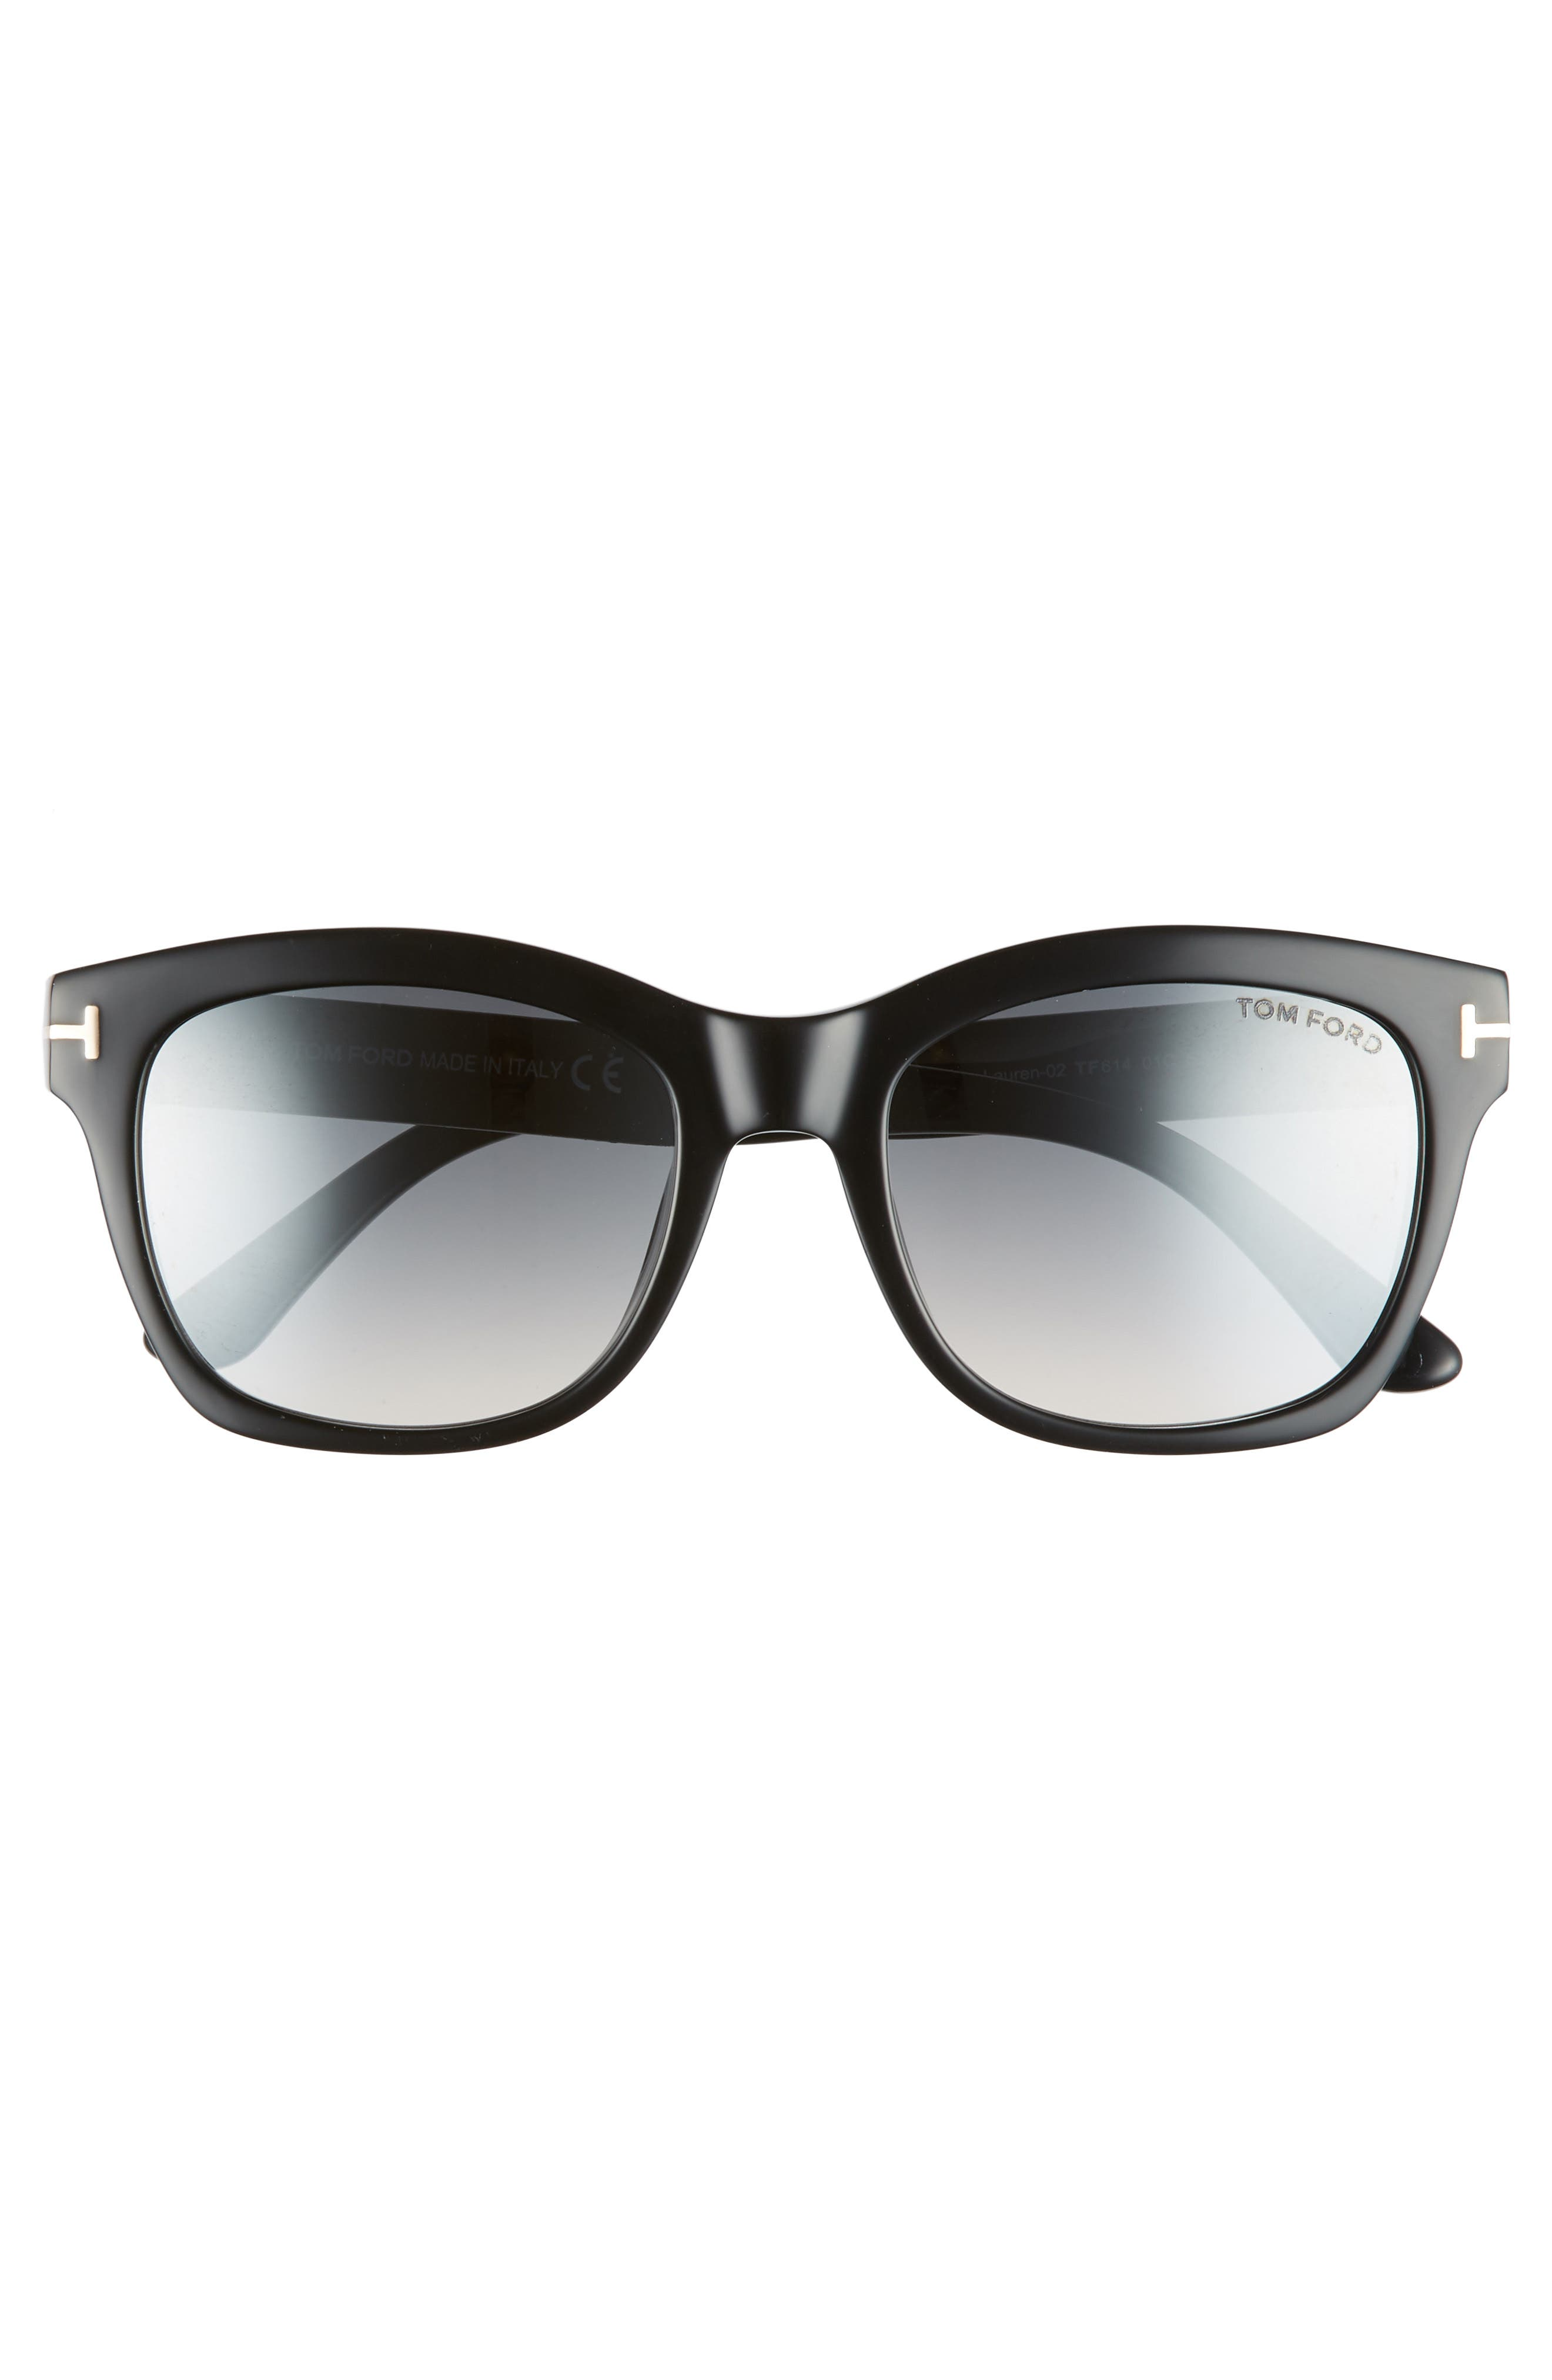 Lauren 52mm Sunglasses,                             Alternate thumbnail 3, color,                             SHINY BLACK/ SMOKE MIRROR